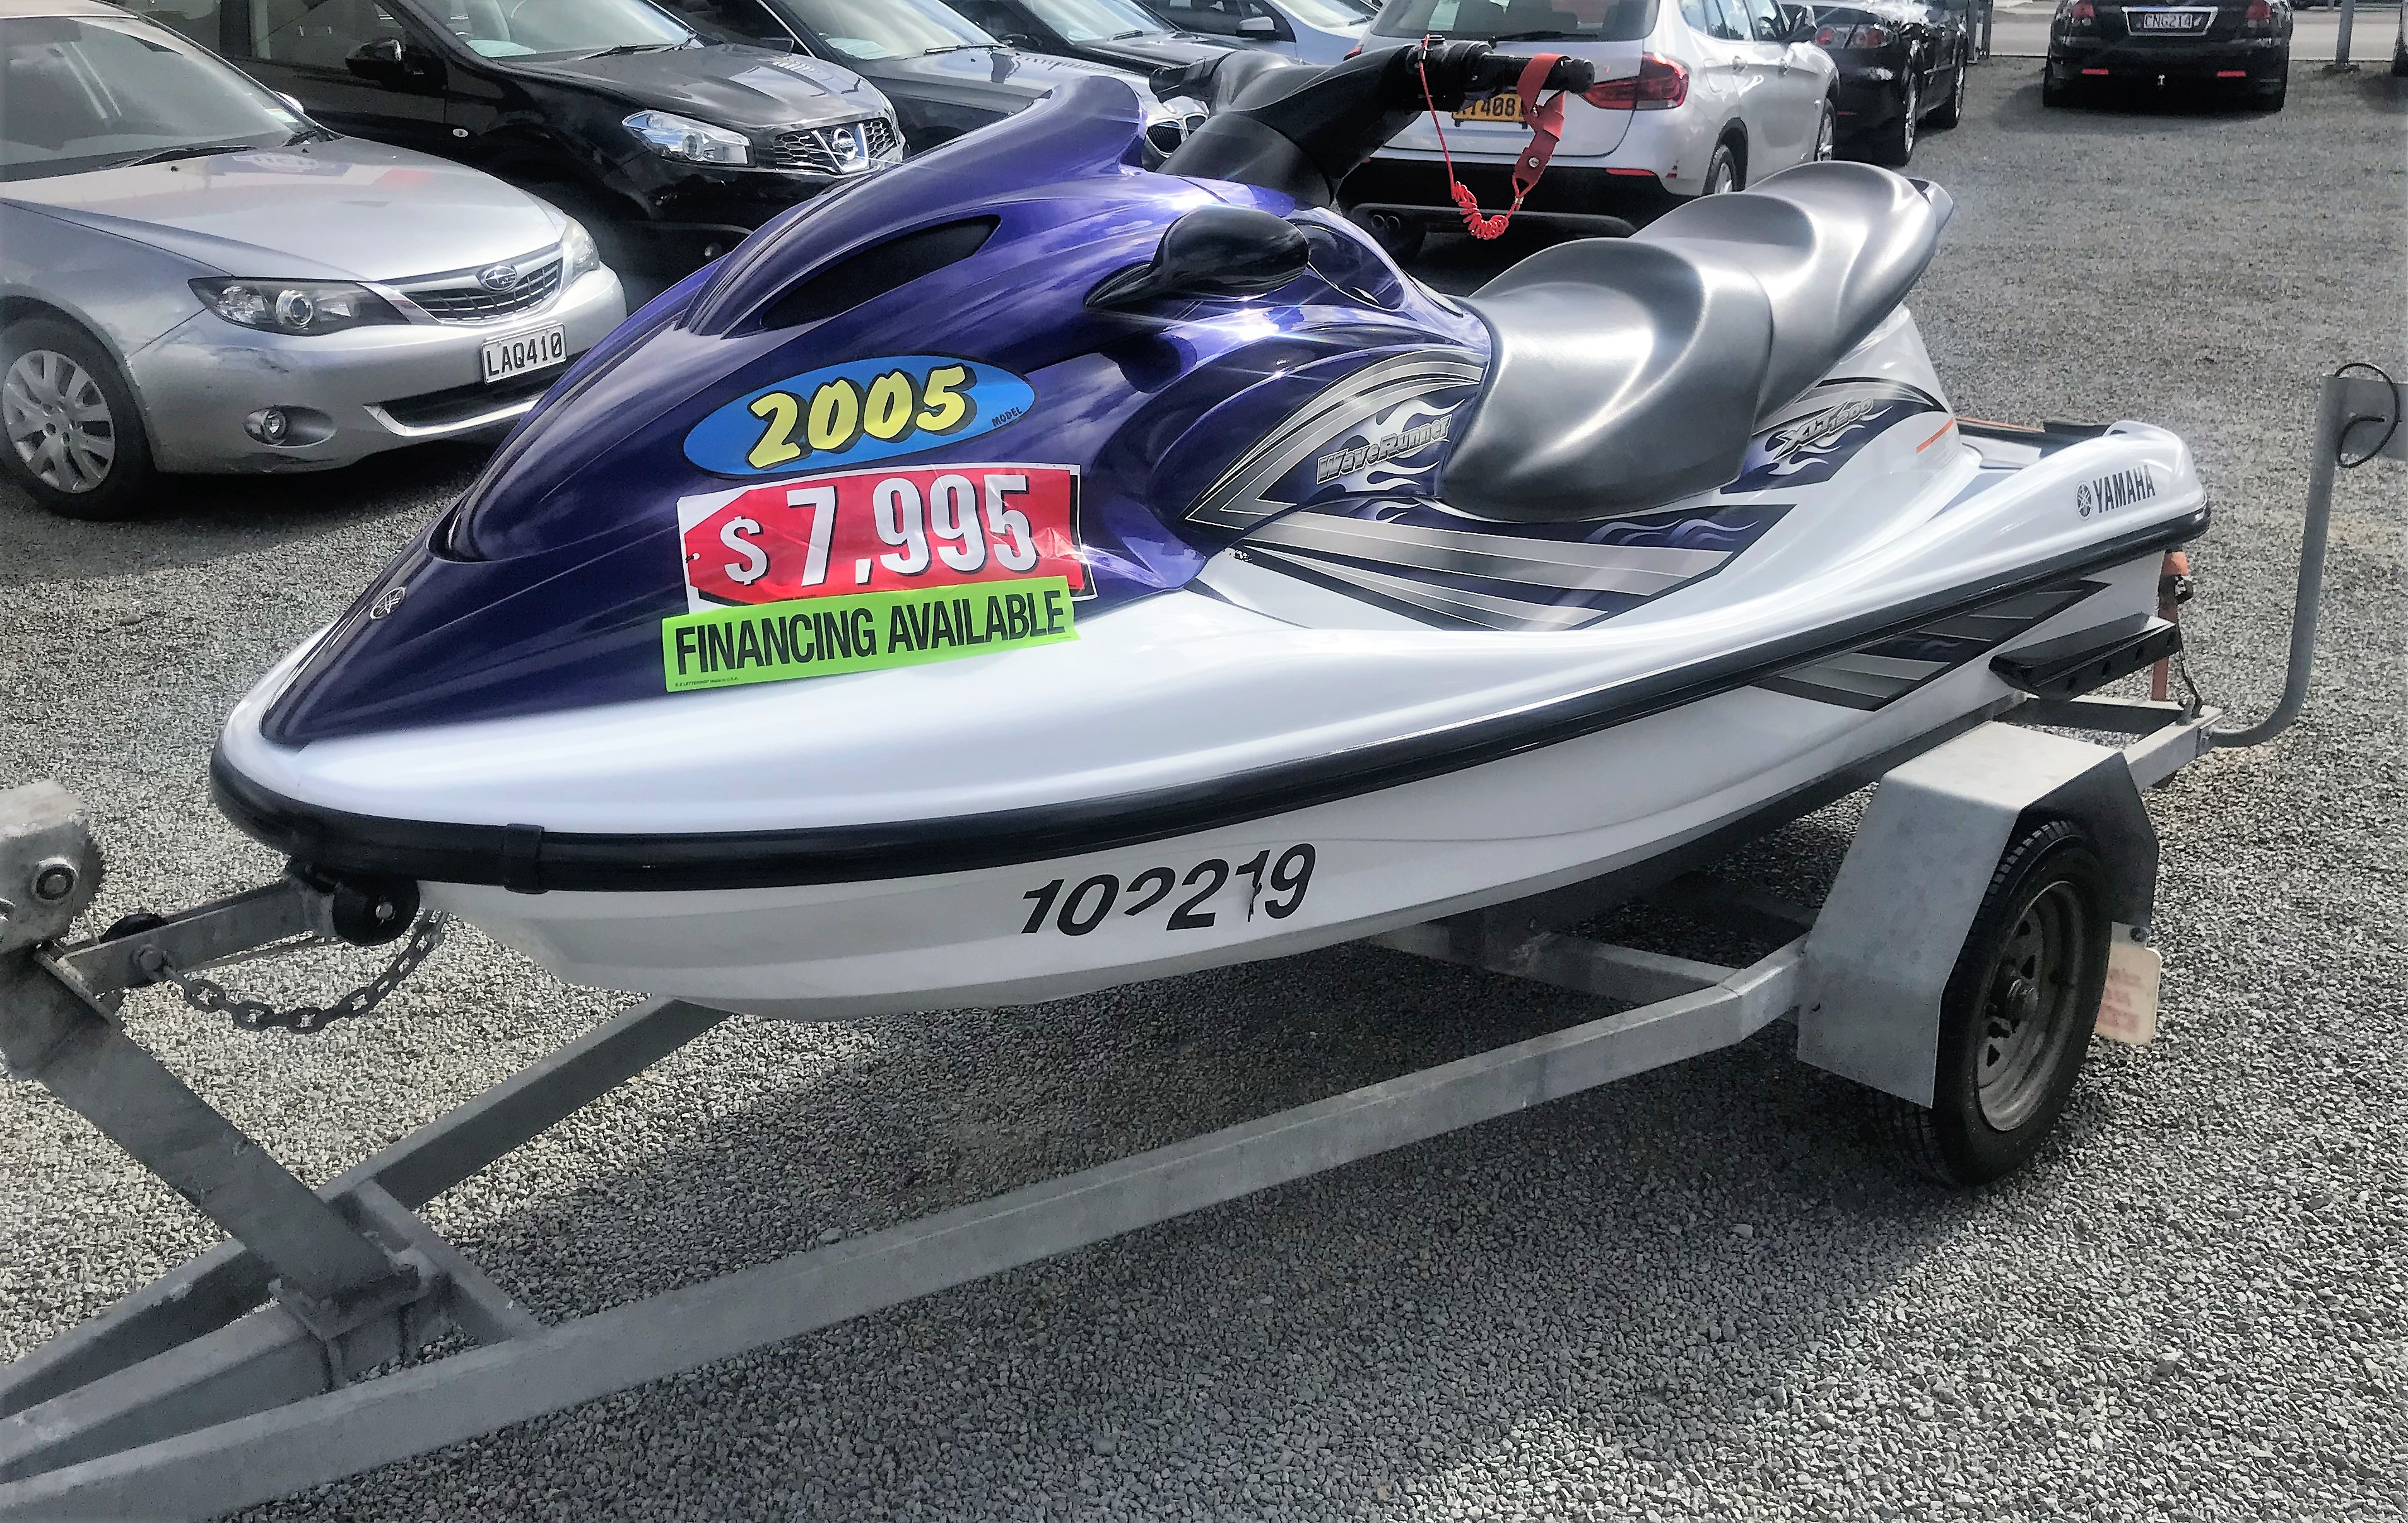 2005 2 STROKE YAMAHA WAVERUNNER XLT1200 JETSKI - $6,995 | Cheap Cars For  Sale | New Zealand | Kamo Display & Sell